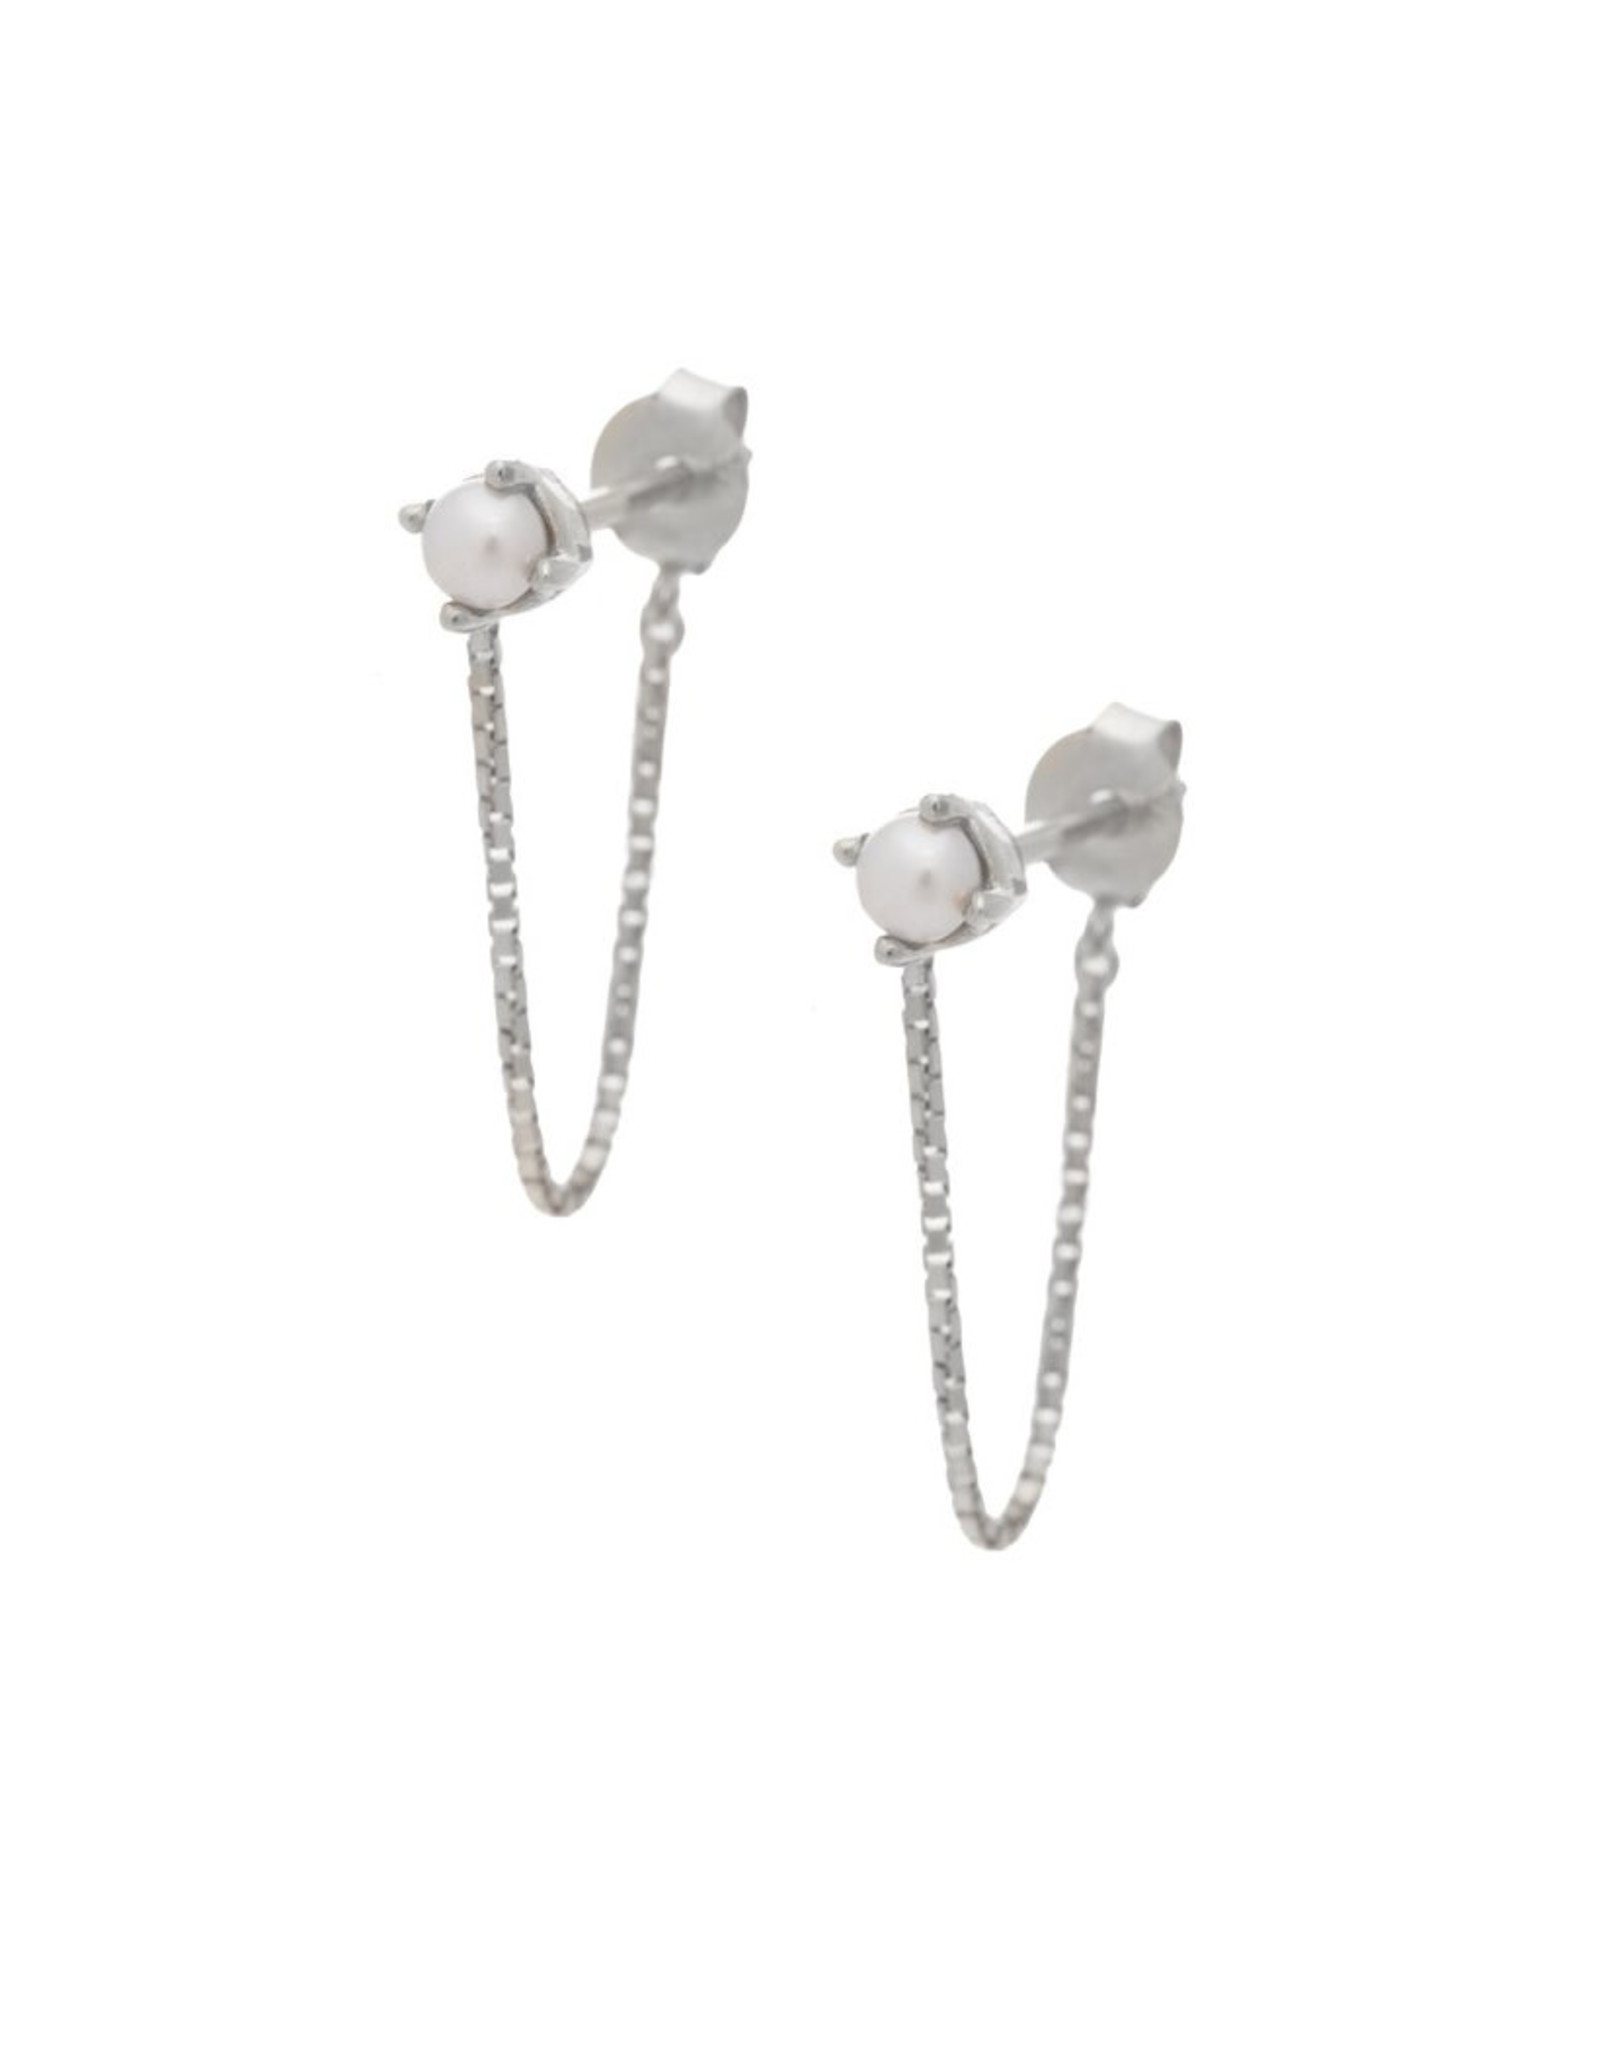 Sarah Mulder Jewelry Silver Alex Short Chain Studs - Pearl